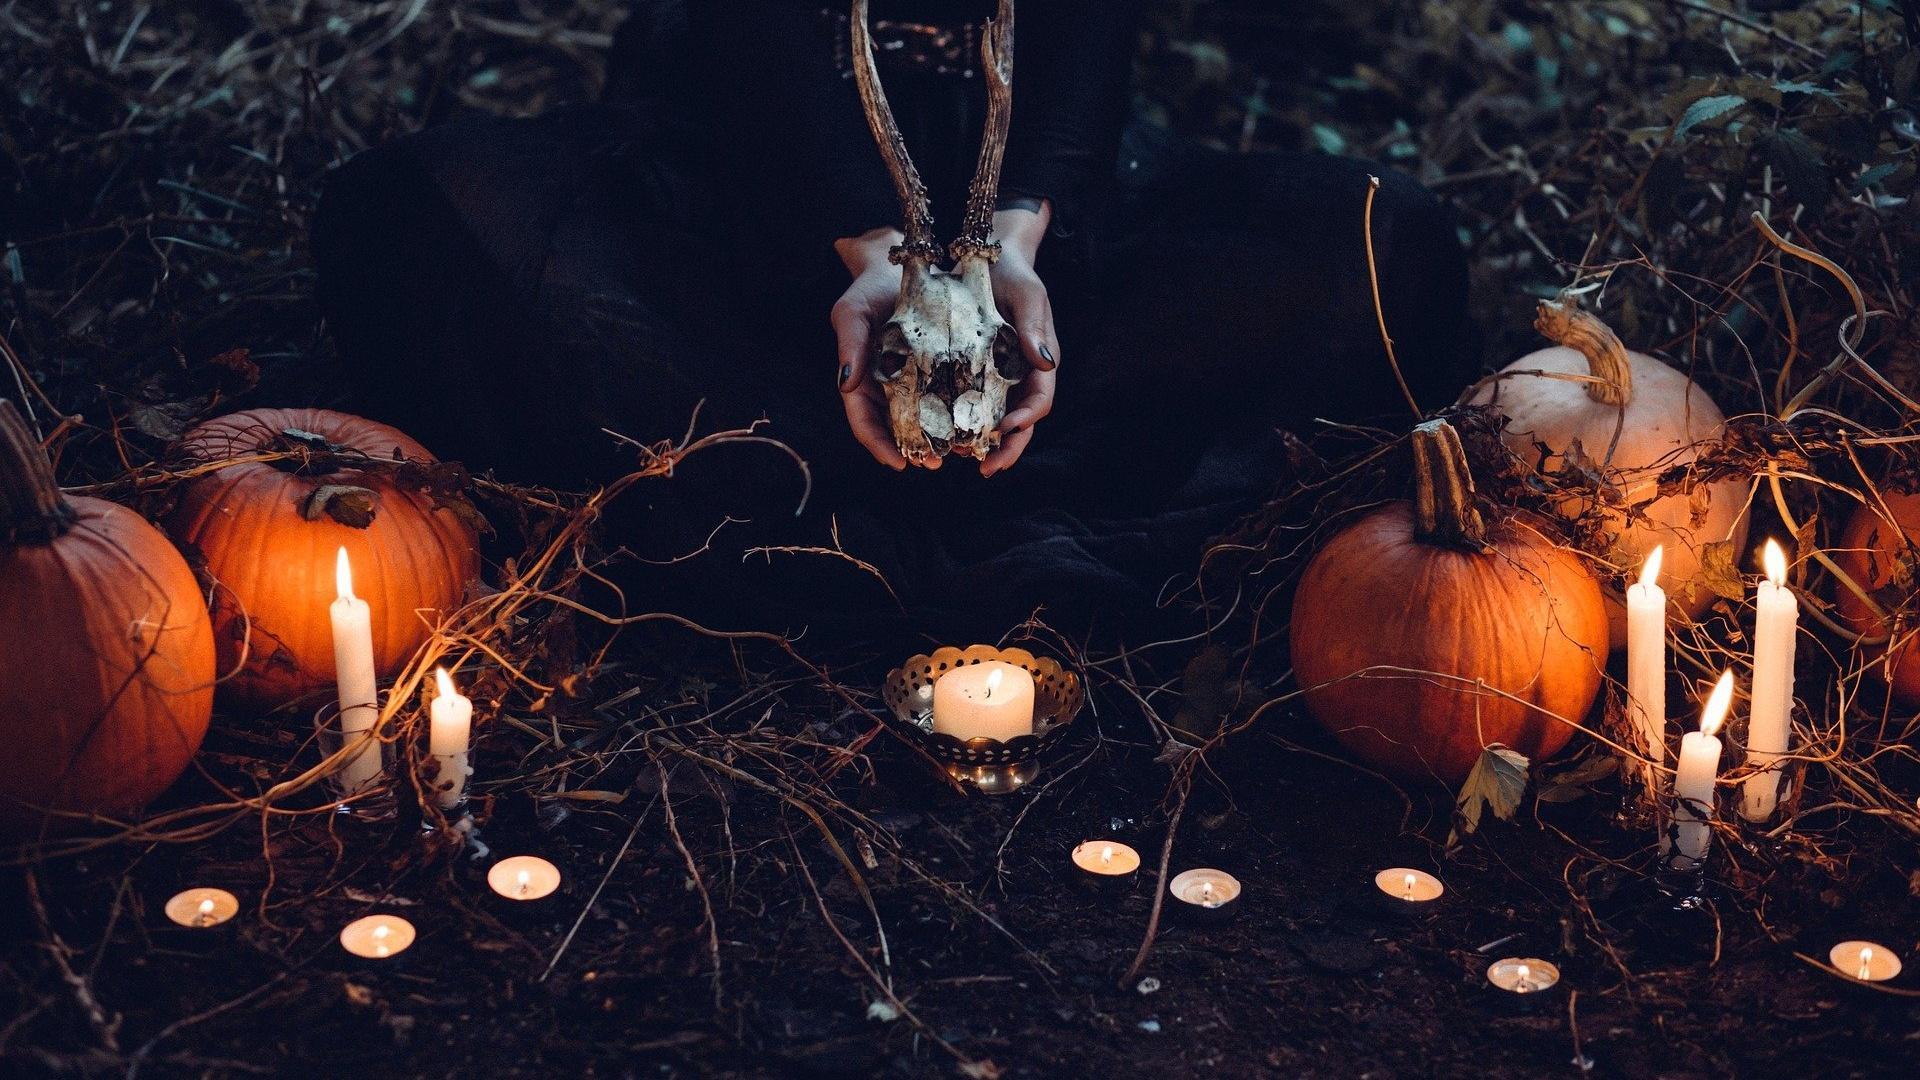 Dekorierter Garten zu Halloween